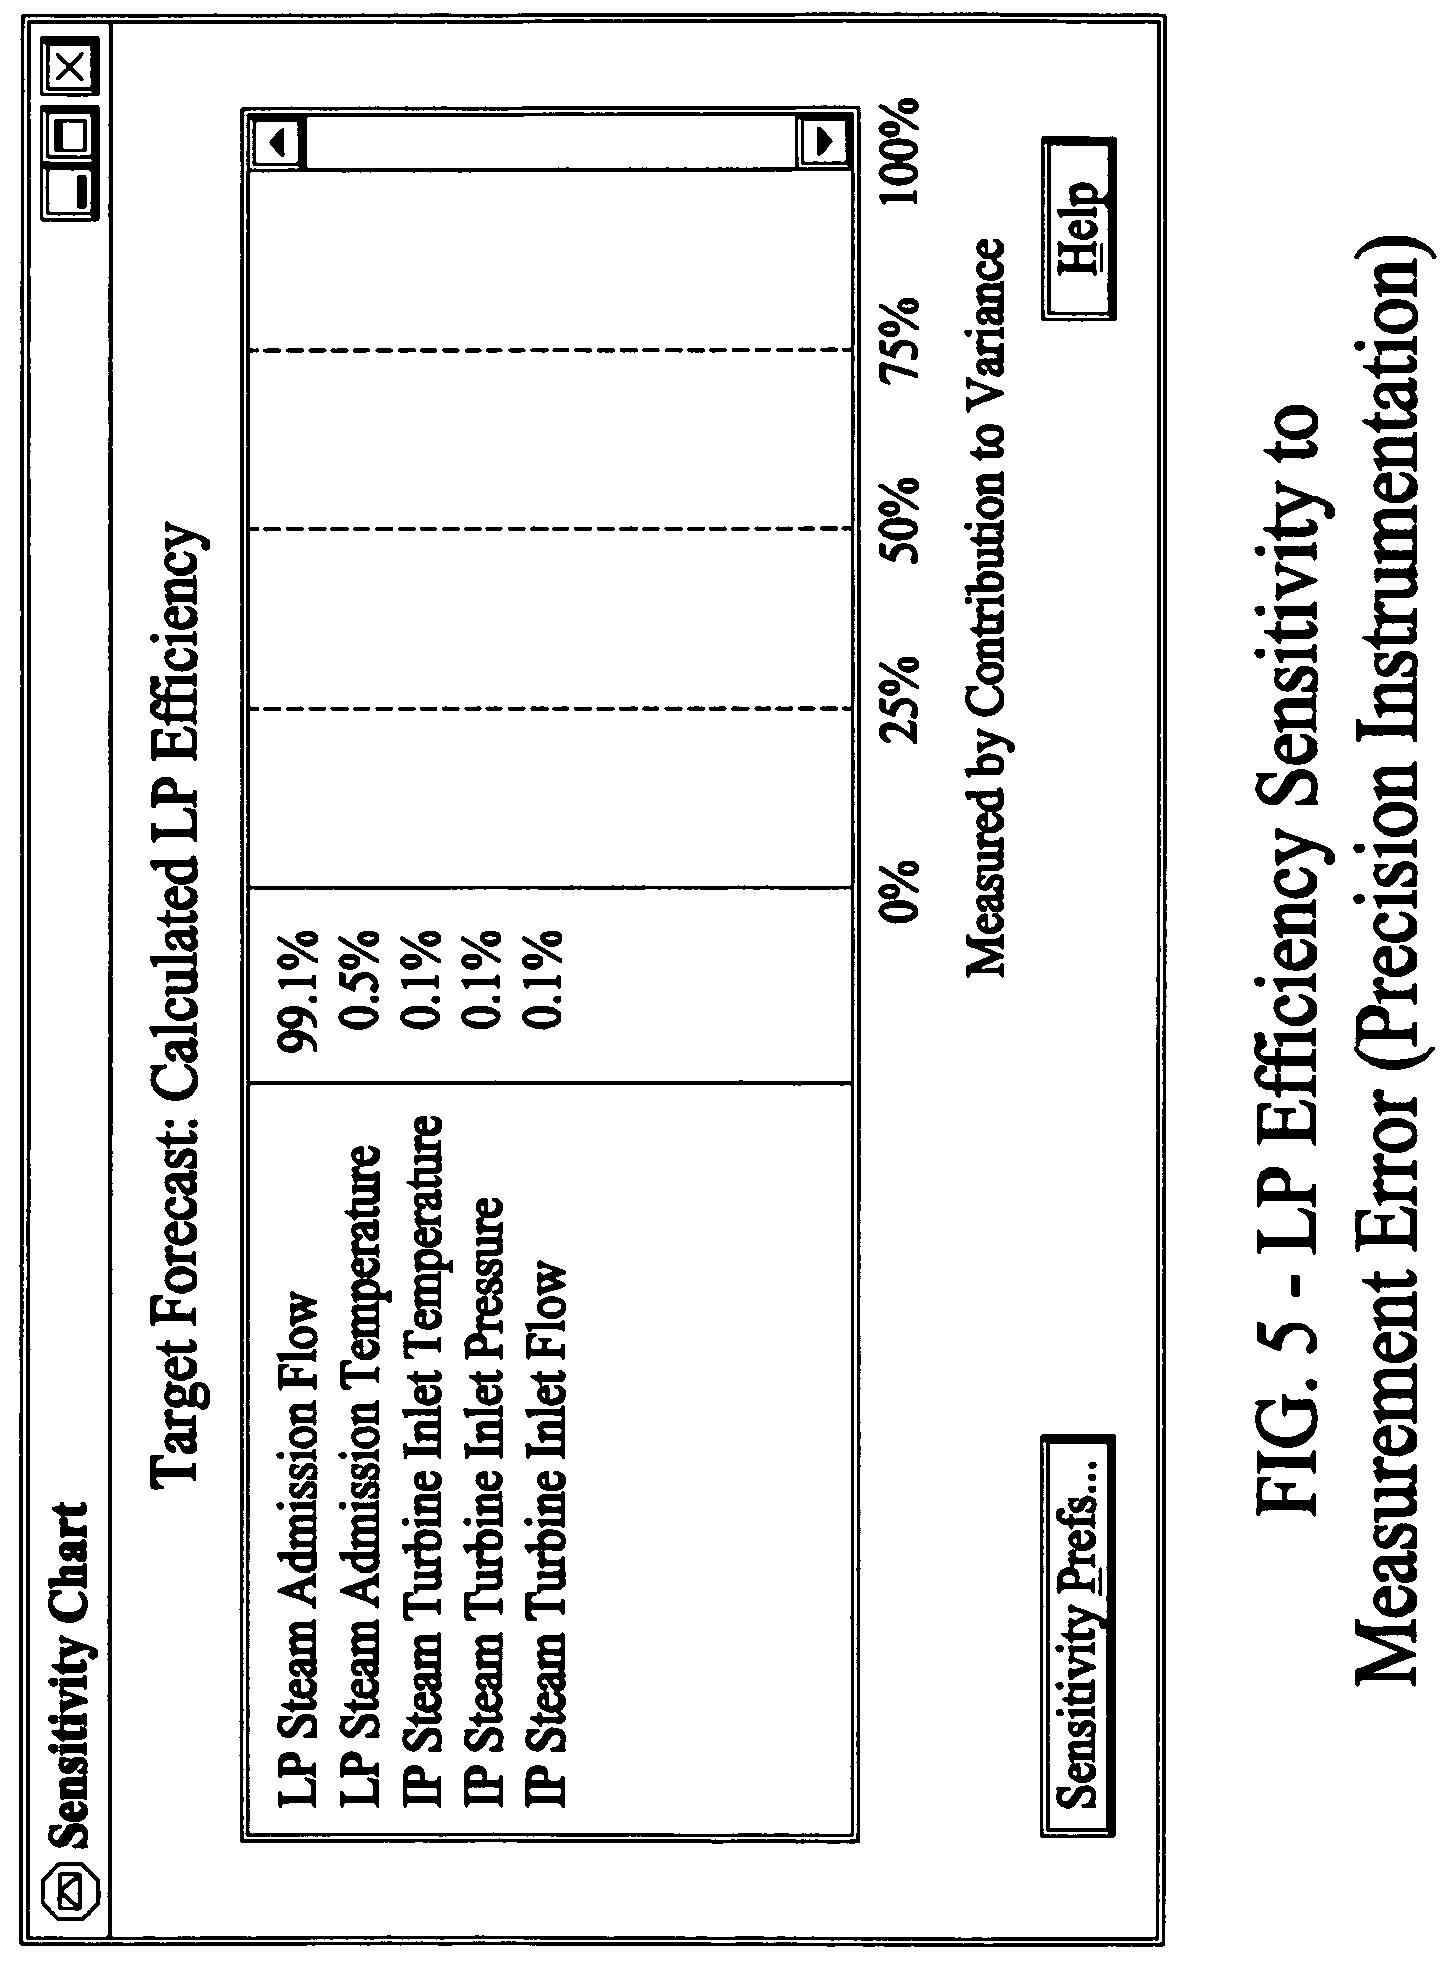 Patent US Methods of measuring steam turbine efficiency